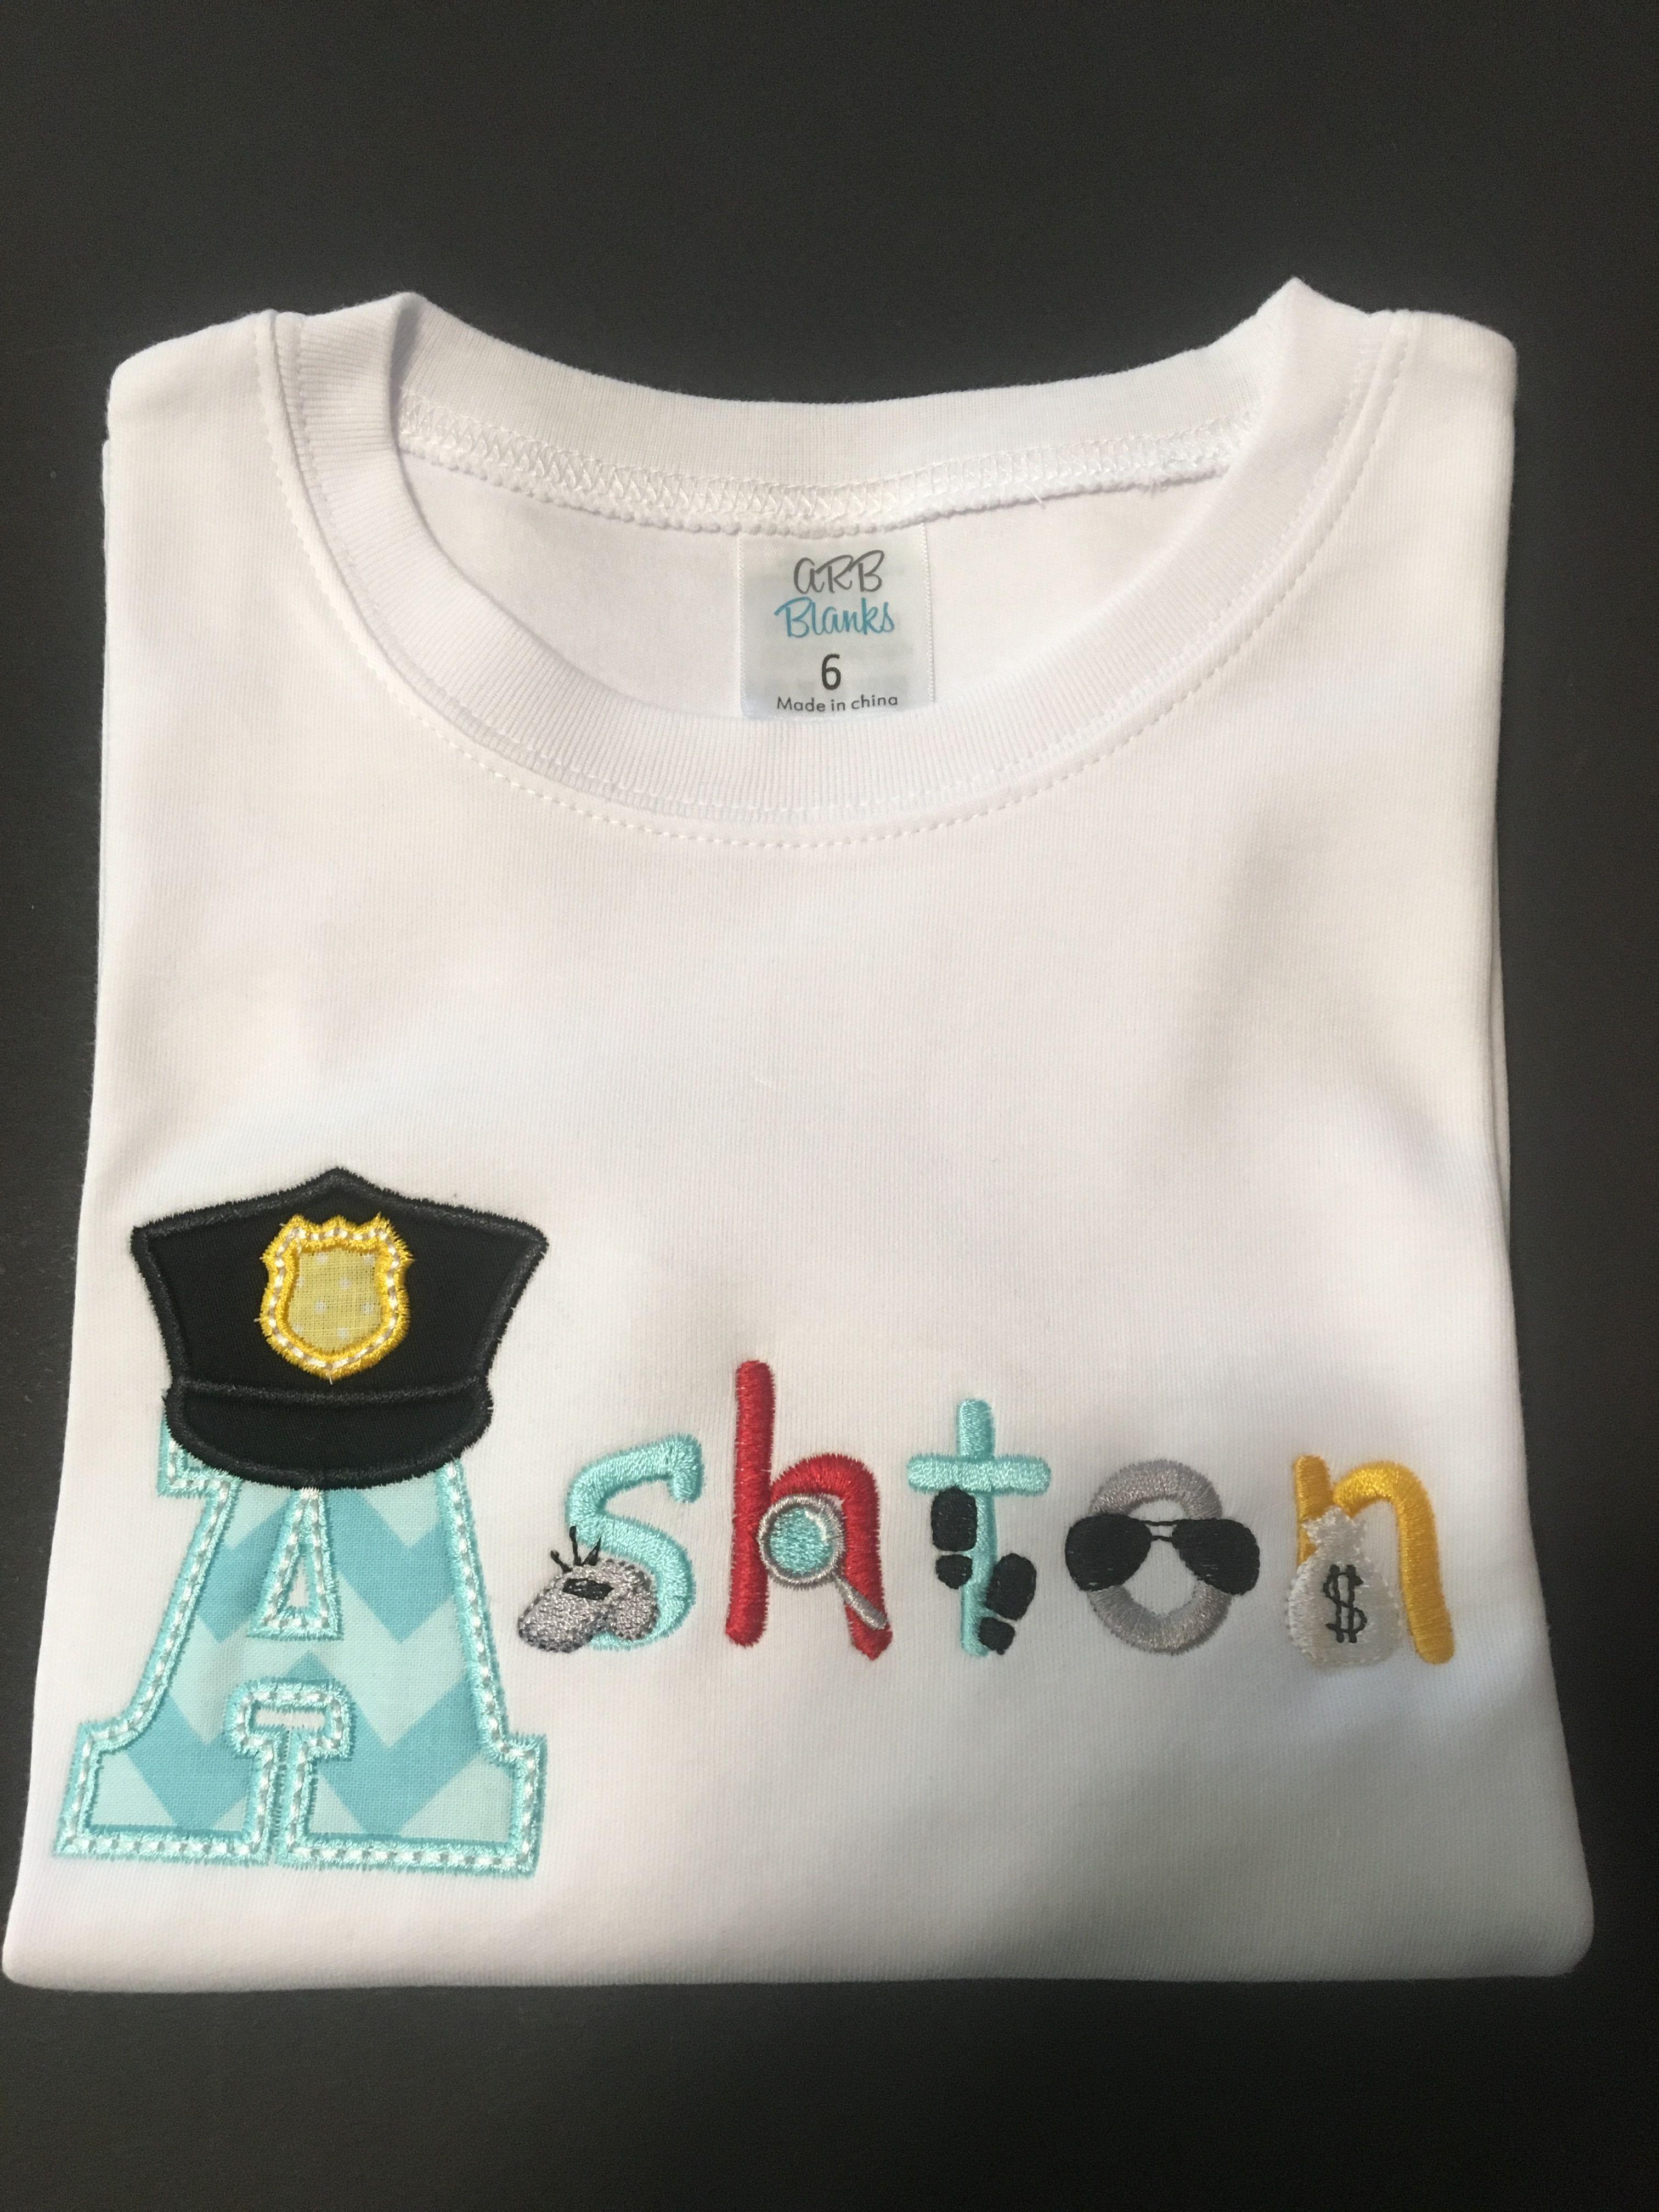 Personalized Police Theme Shirt www etsy com/shop